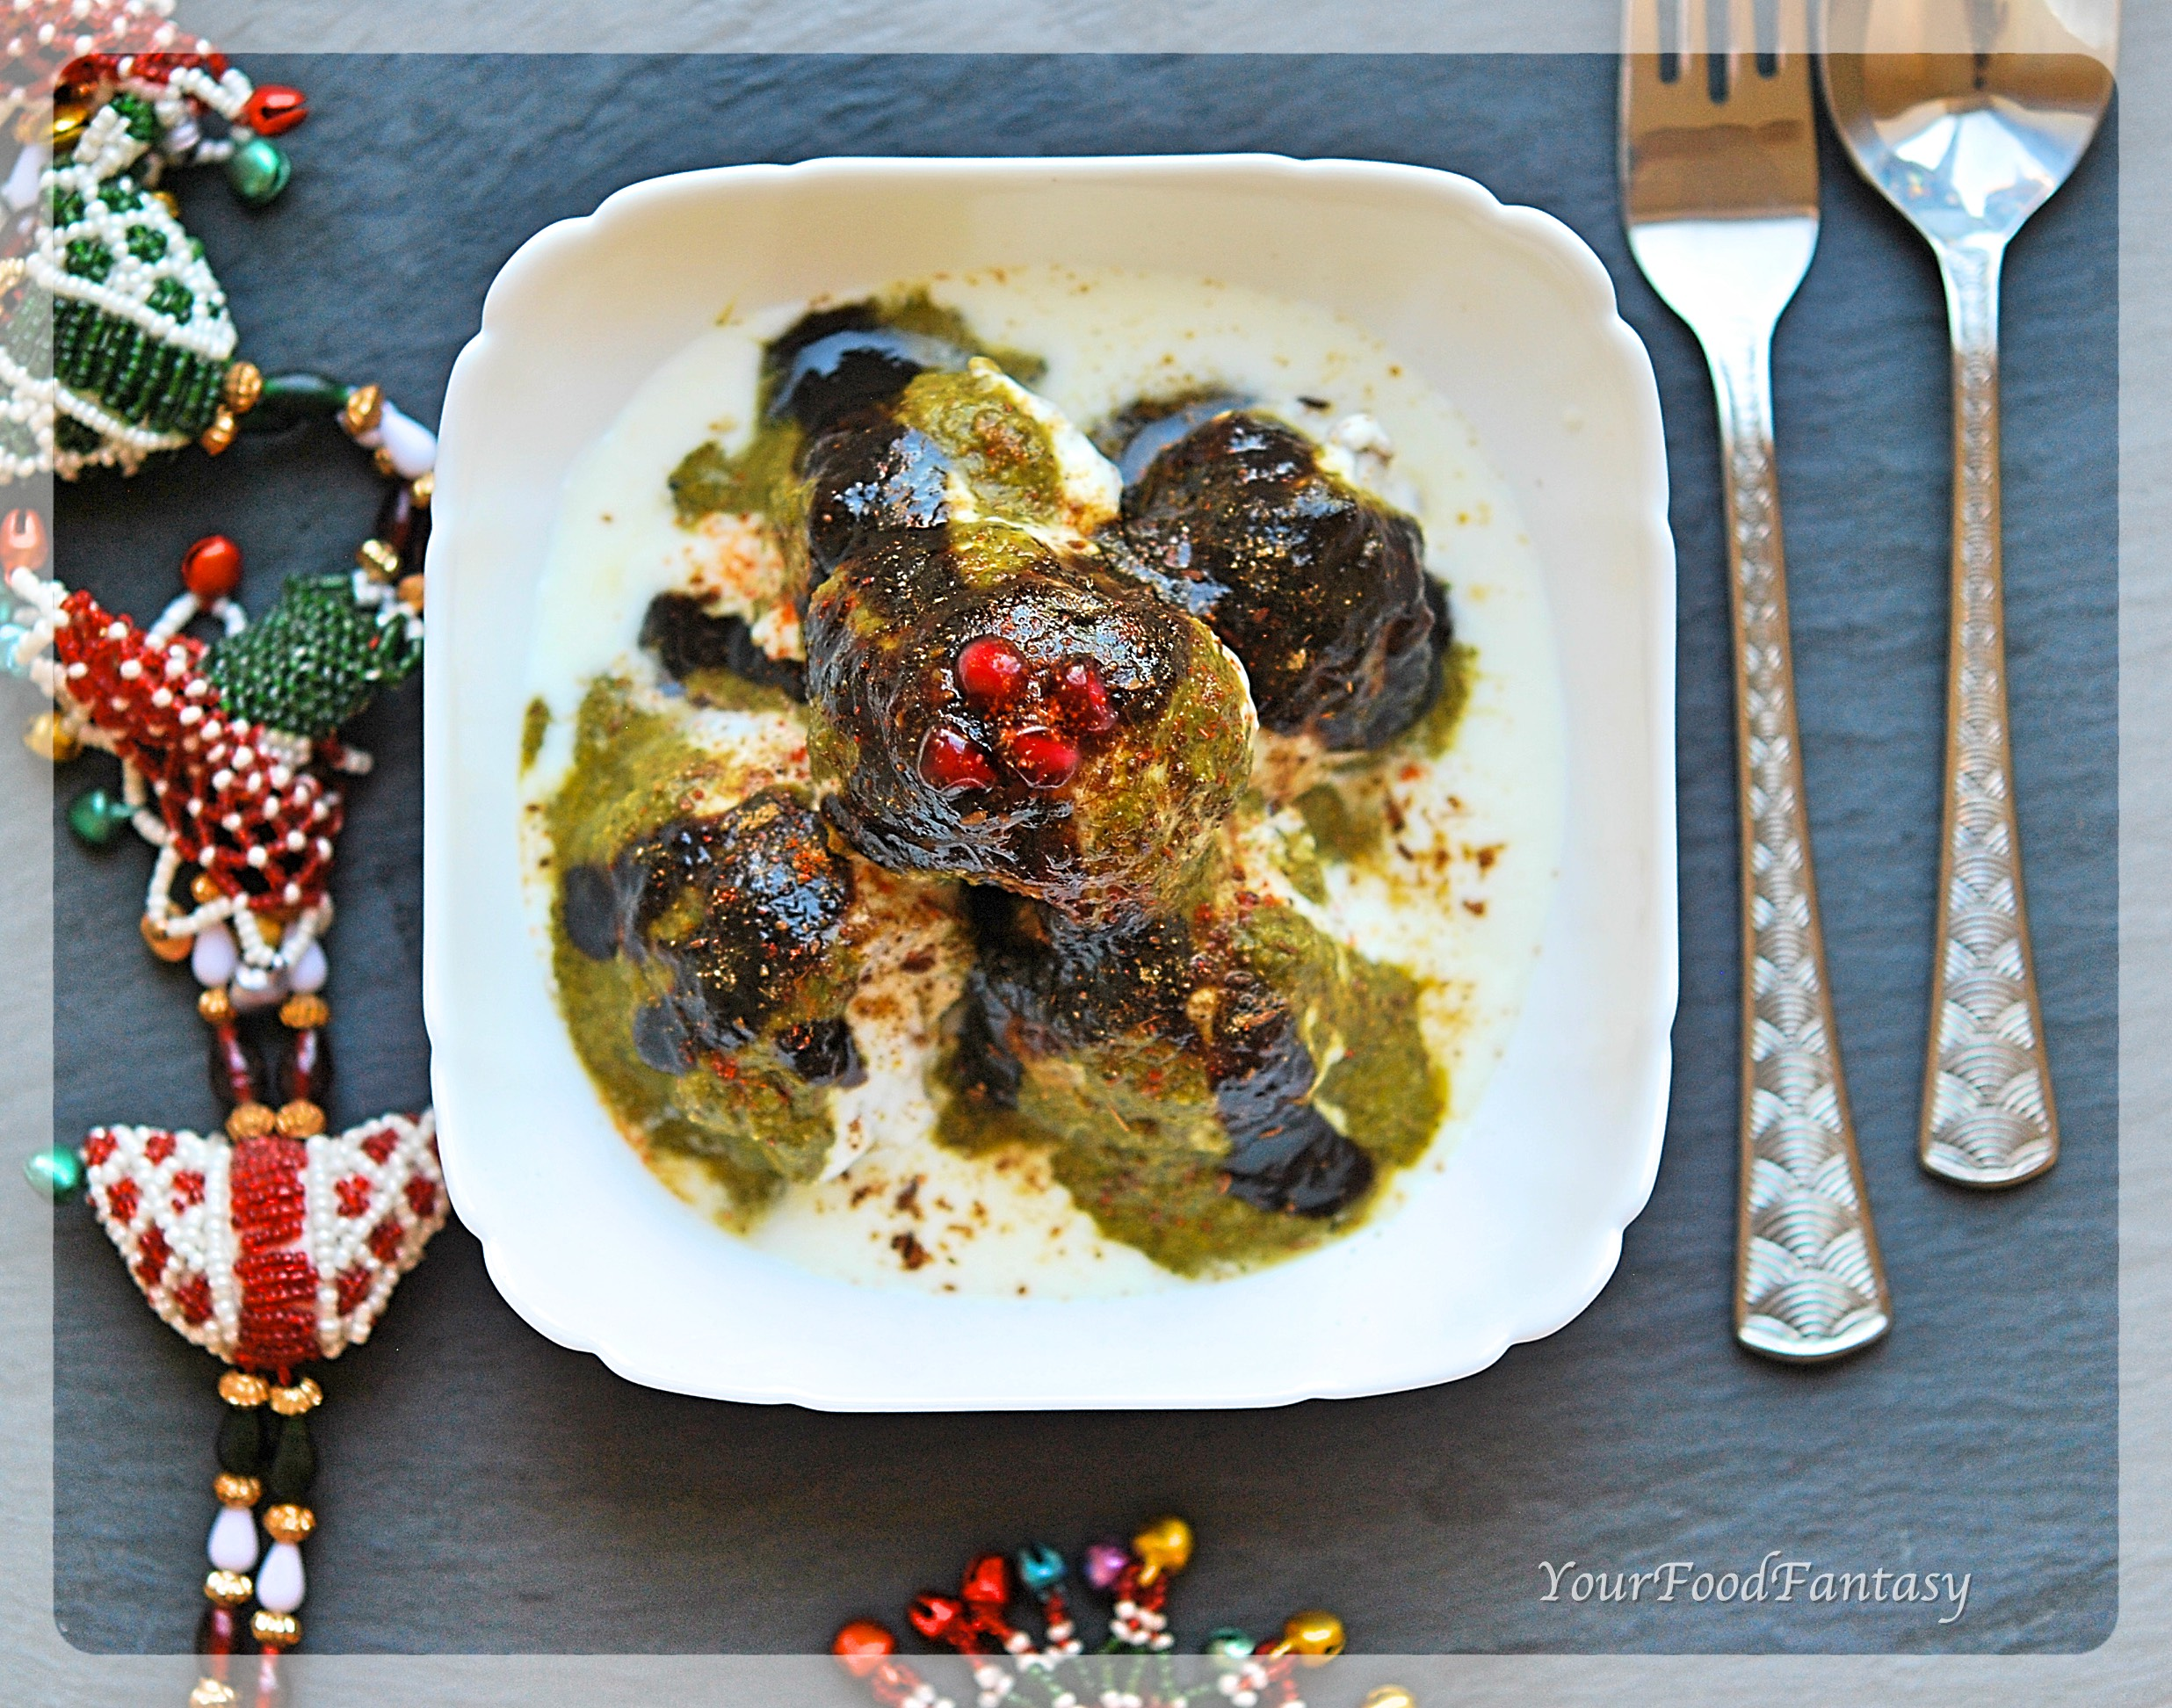 Dahi vada Recipe   Your Food Fantasy